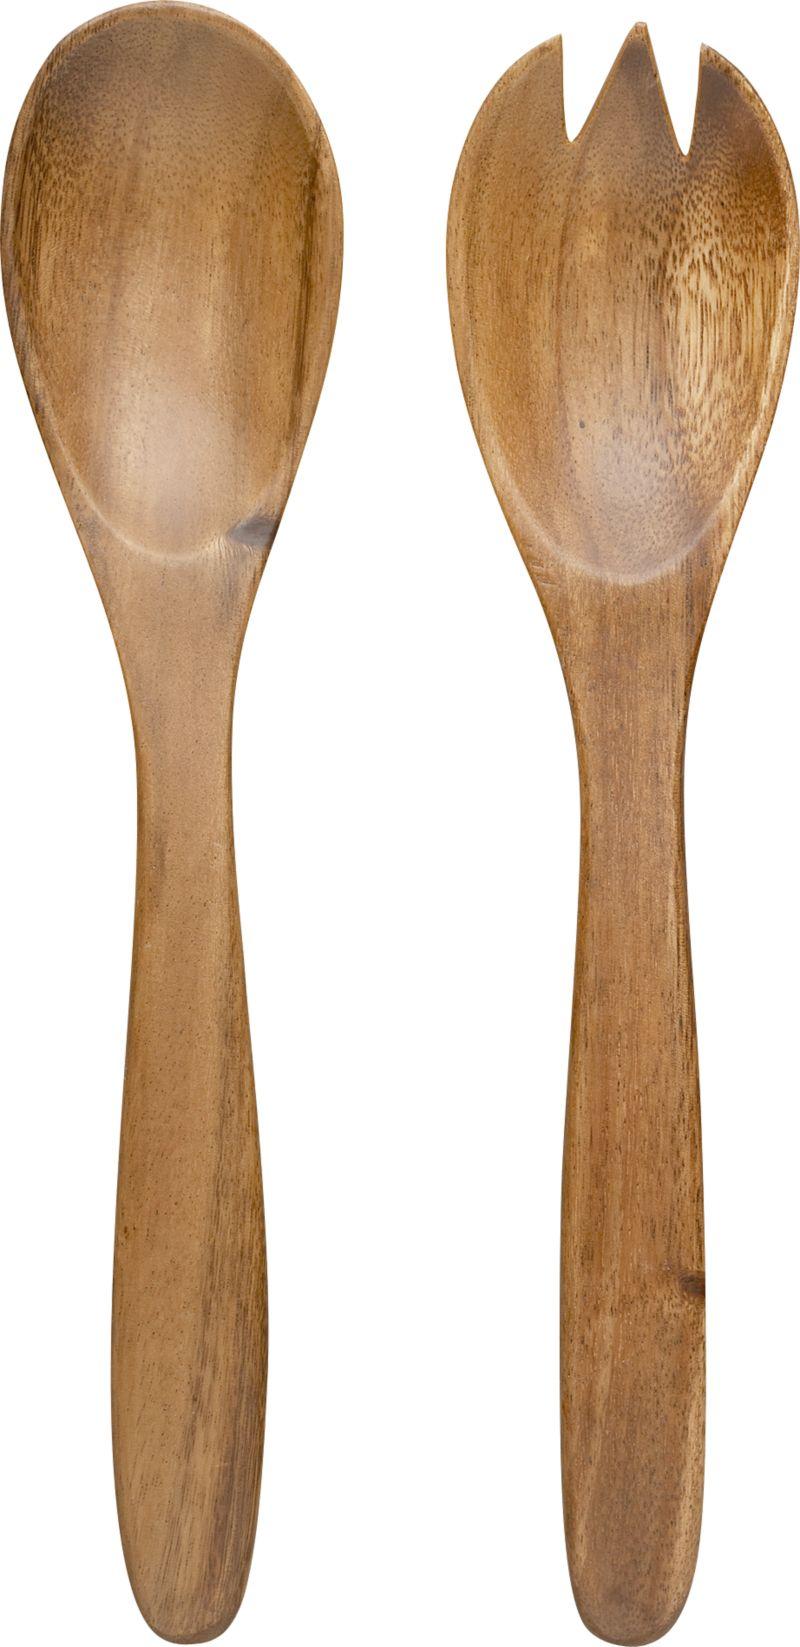 The rich sweeping grain of solid acacia wood makes these servers a natural for entertaining.<br /><br /><NEWTAG/><ul><li>Plantation-grown acacia wood</li><li>Foodsafe finish</li><li>Hand wash</li><li>Made in The Philippines</li></ul>